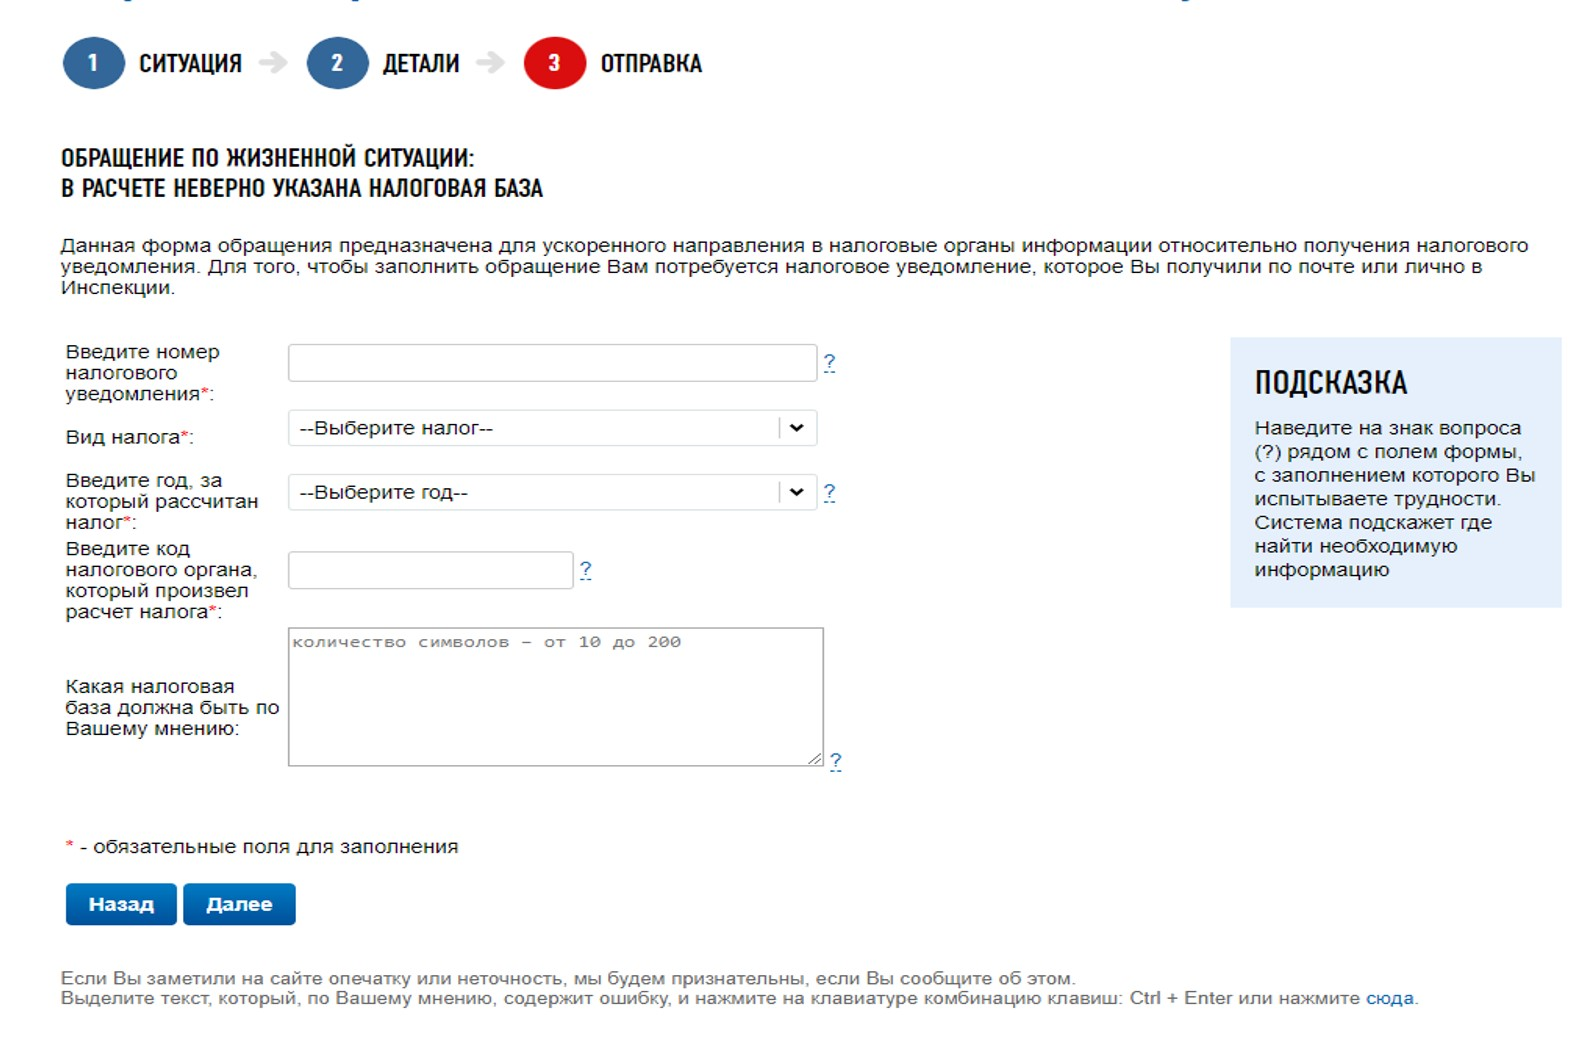 фнс сервис 3 https://grosh-blog.ru